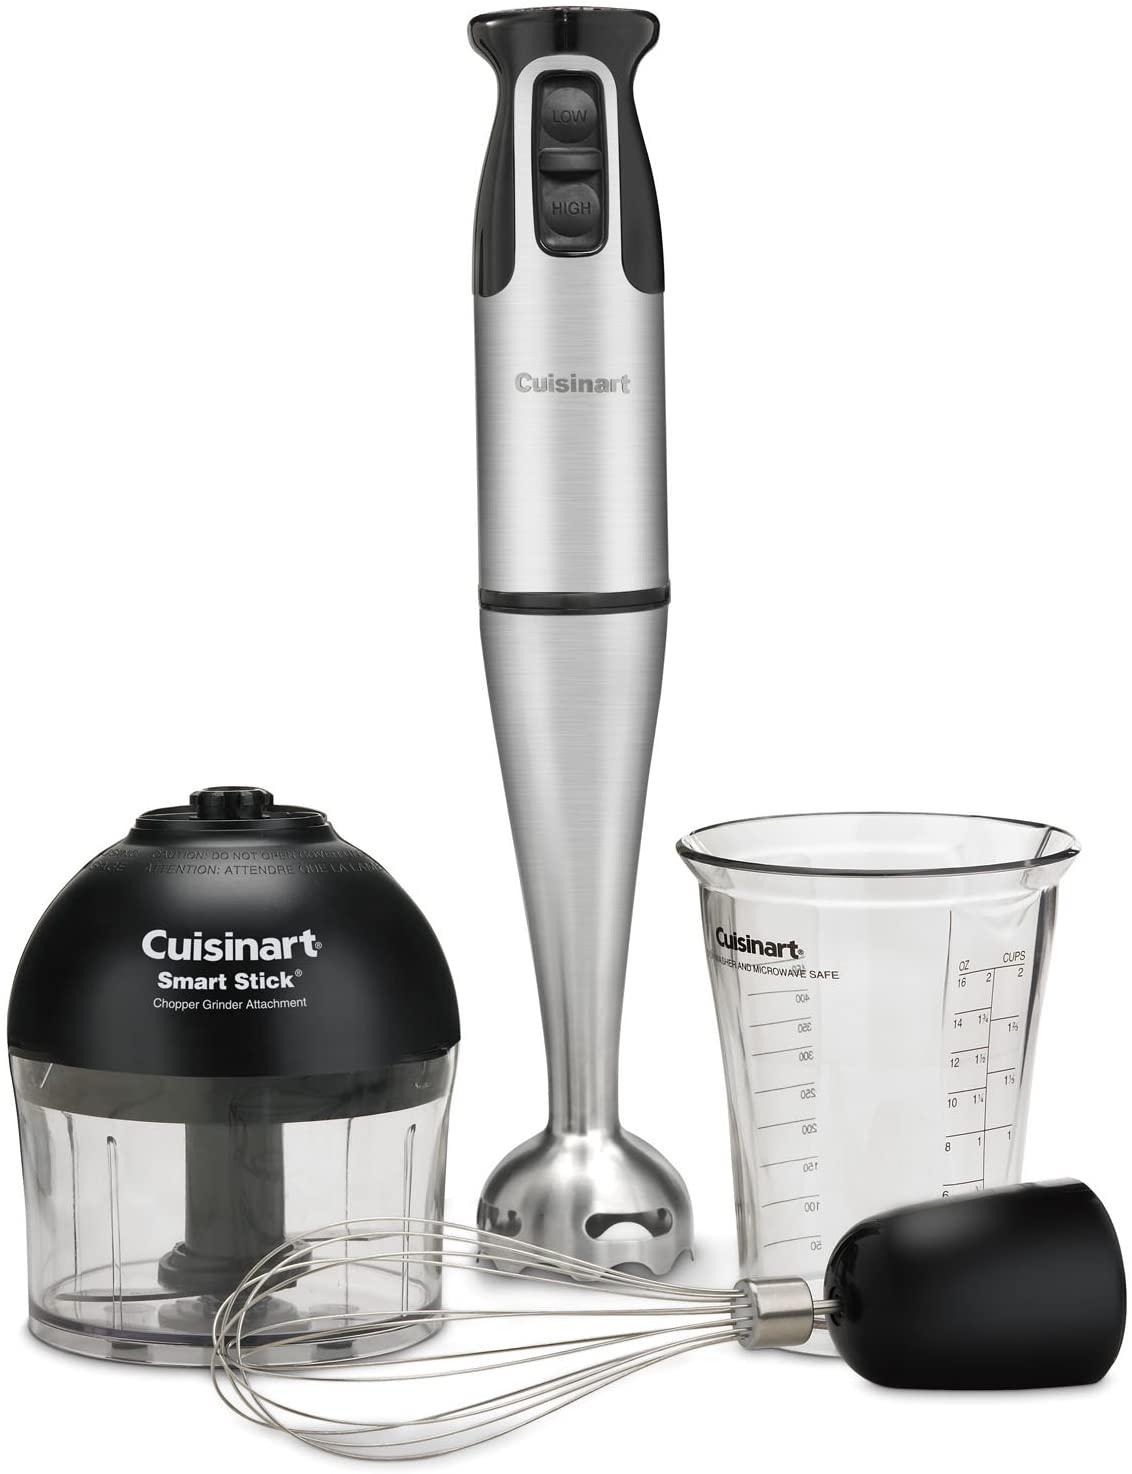 Cuisinart-Smart-Stick-Blender